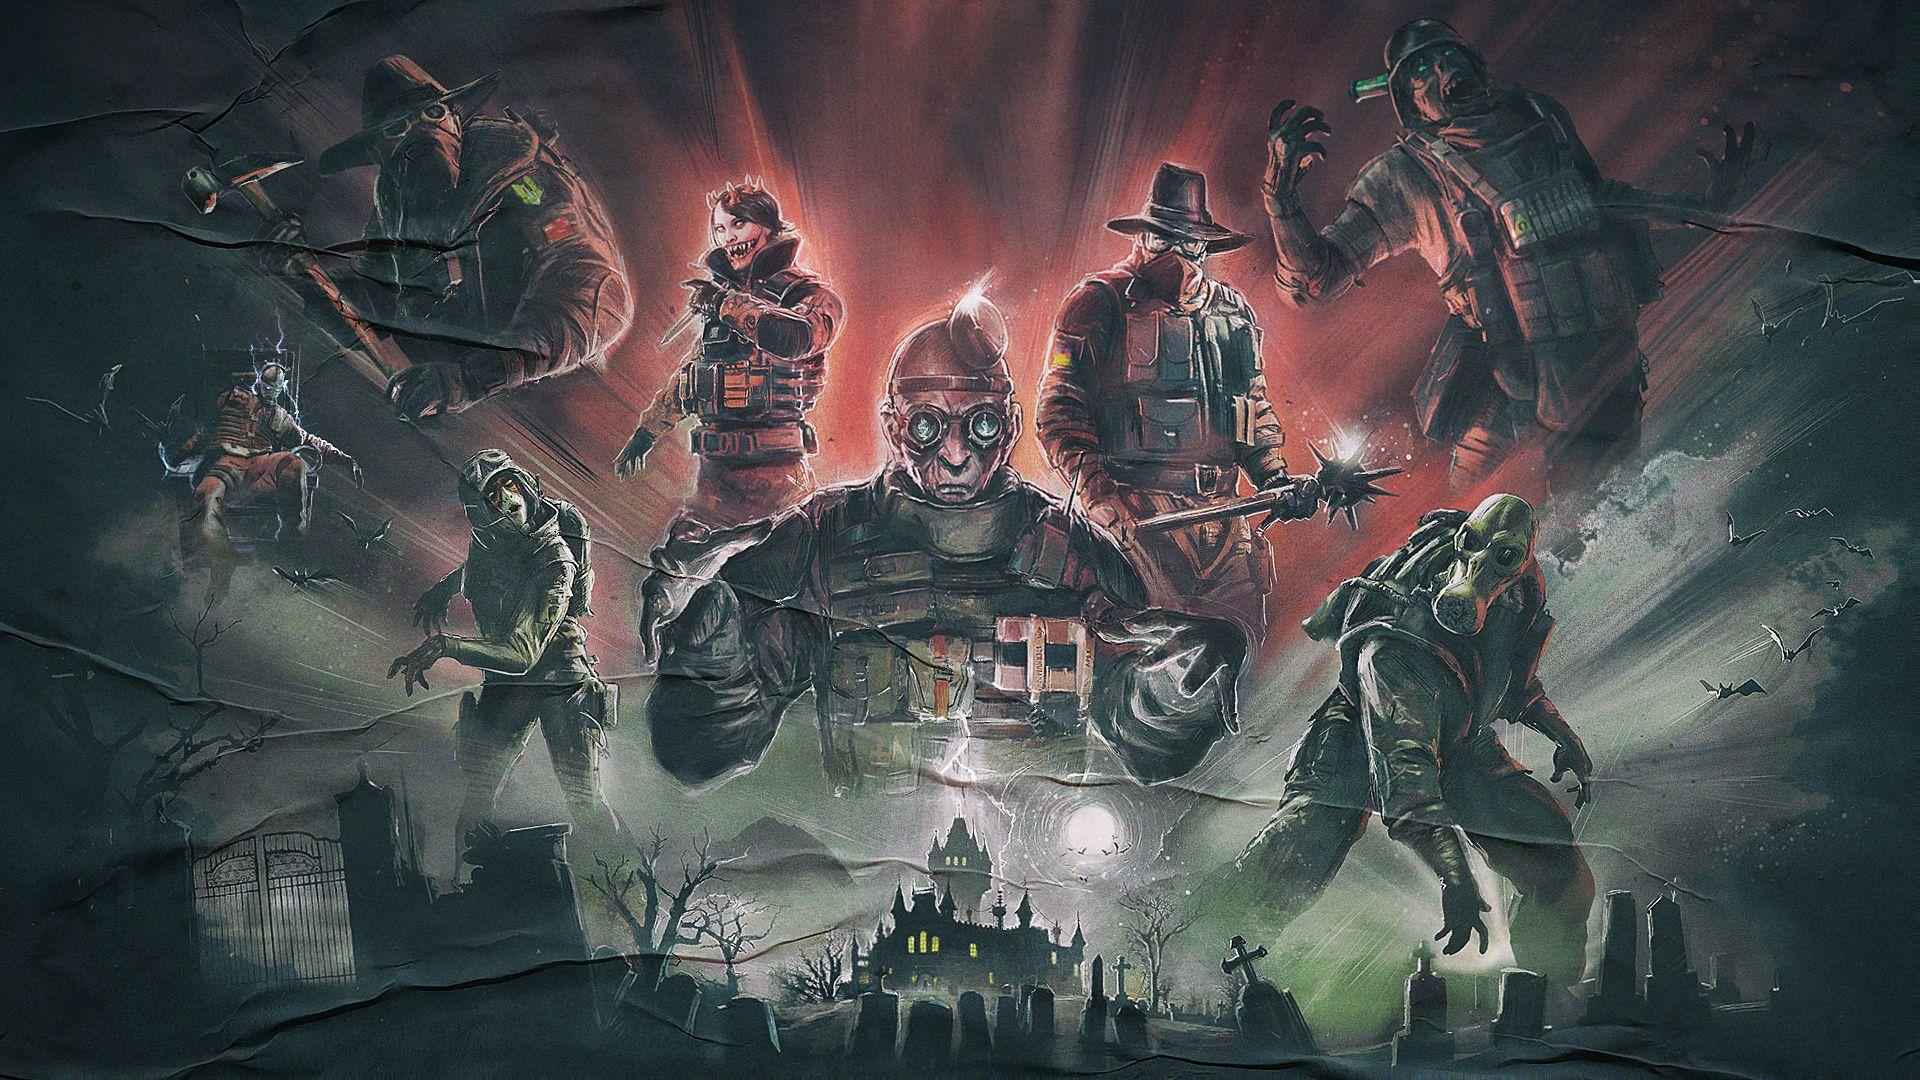 Doktor S Curse With Images Rainbow Six Siege Art Theme Park Map